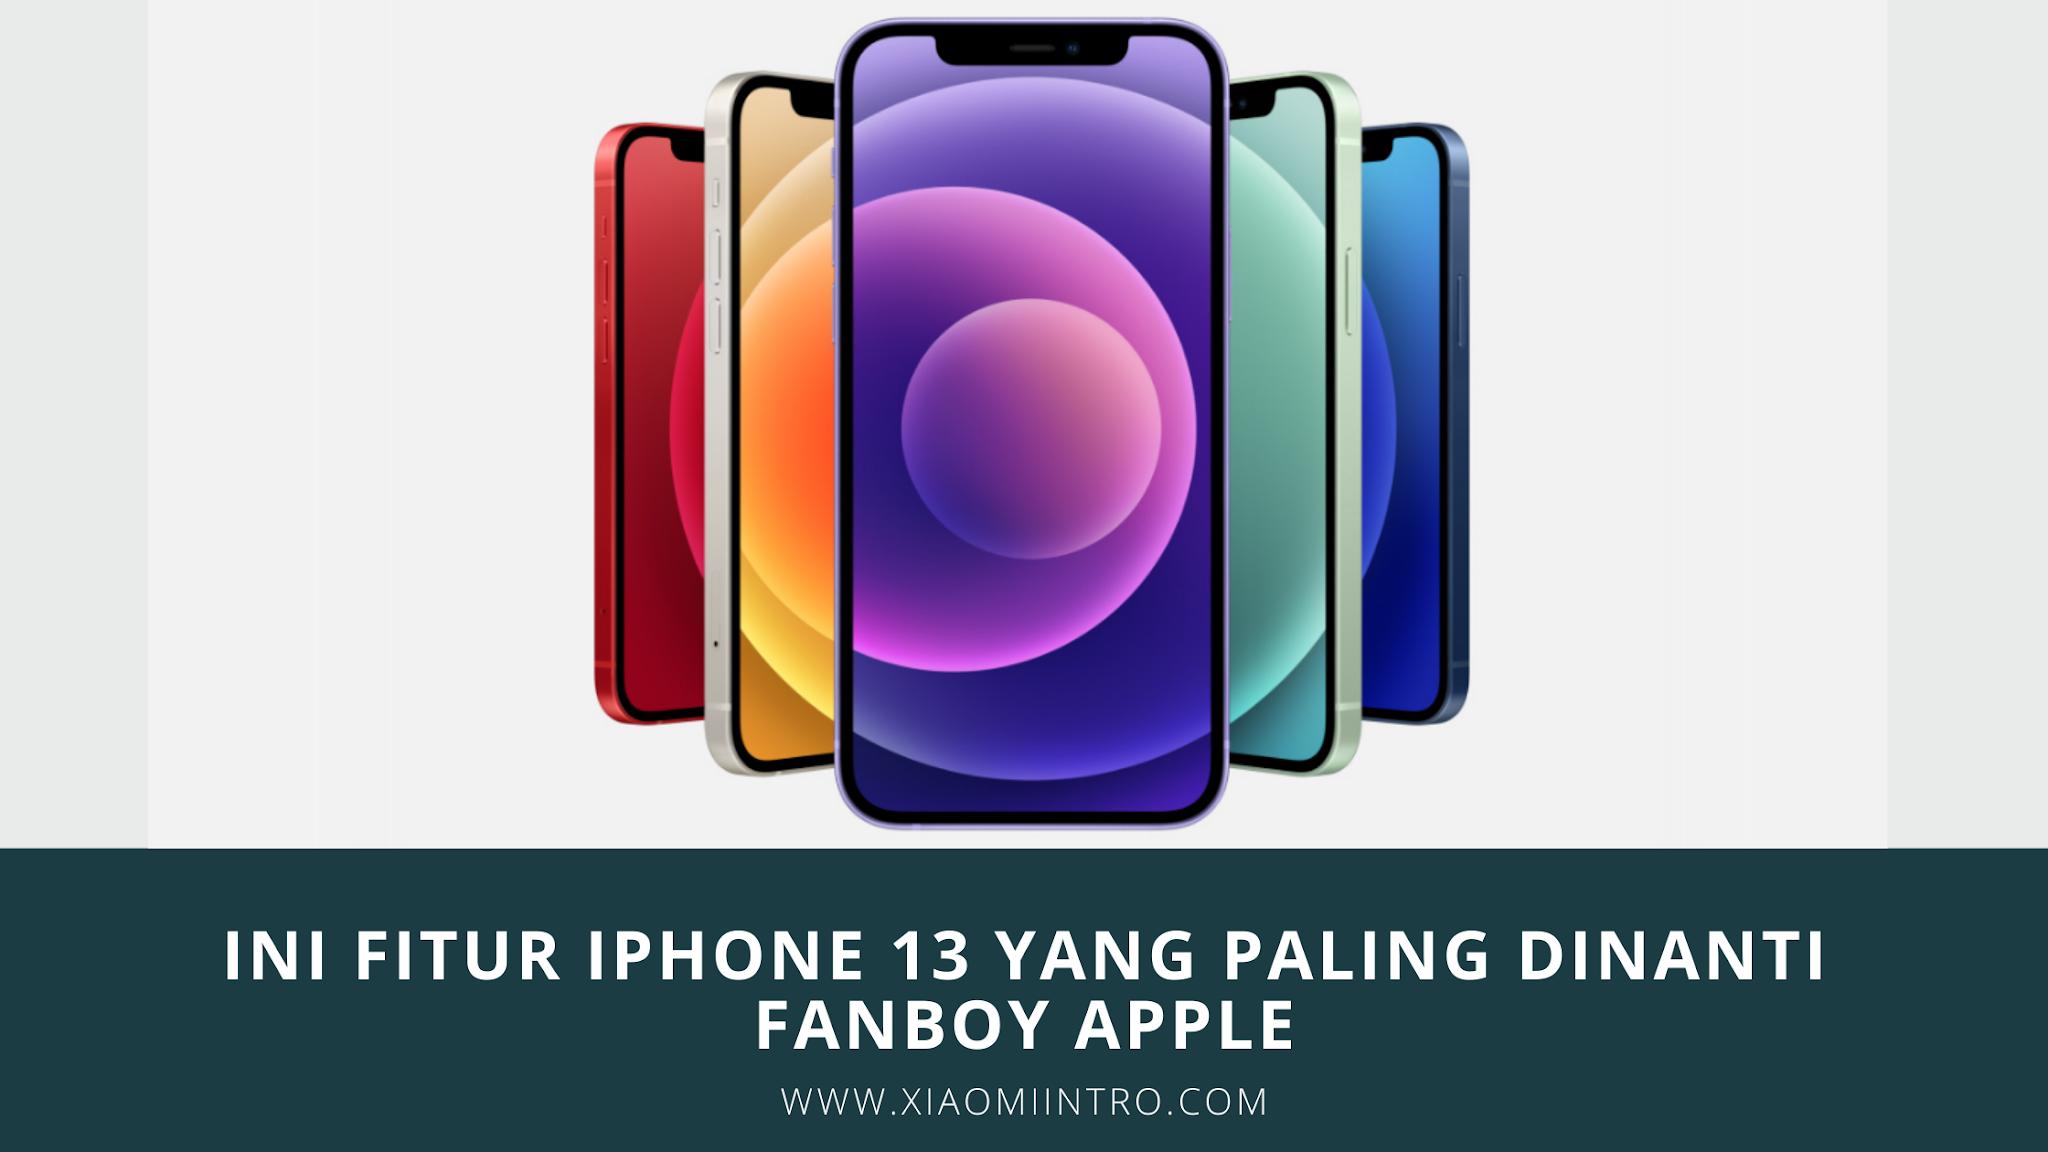 Ini Fitur Iphone 13 Yang Paling Dinanti Fanboy Apple